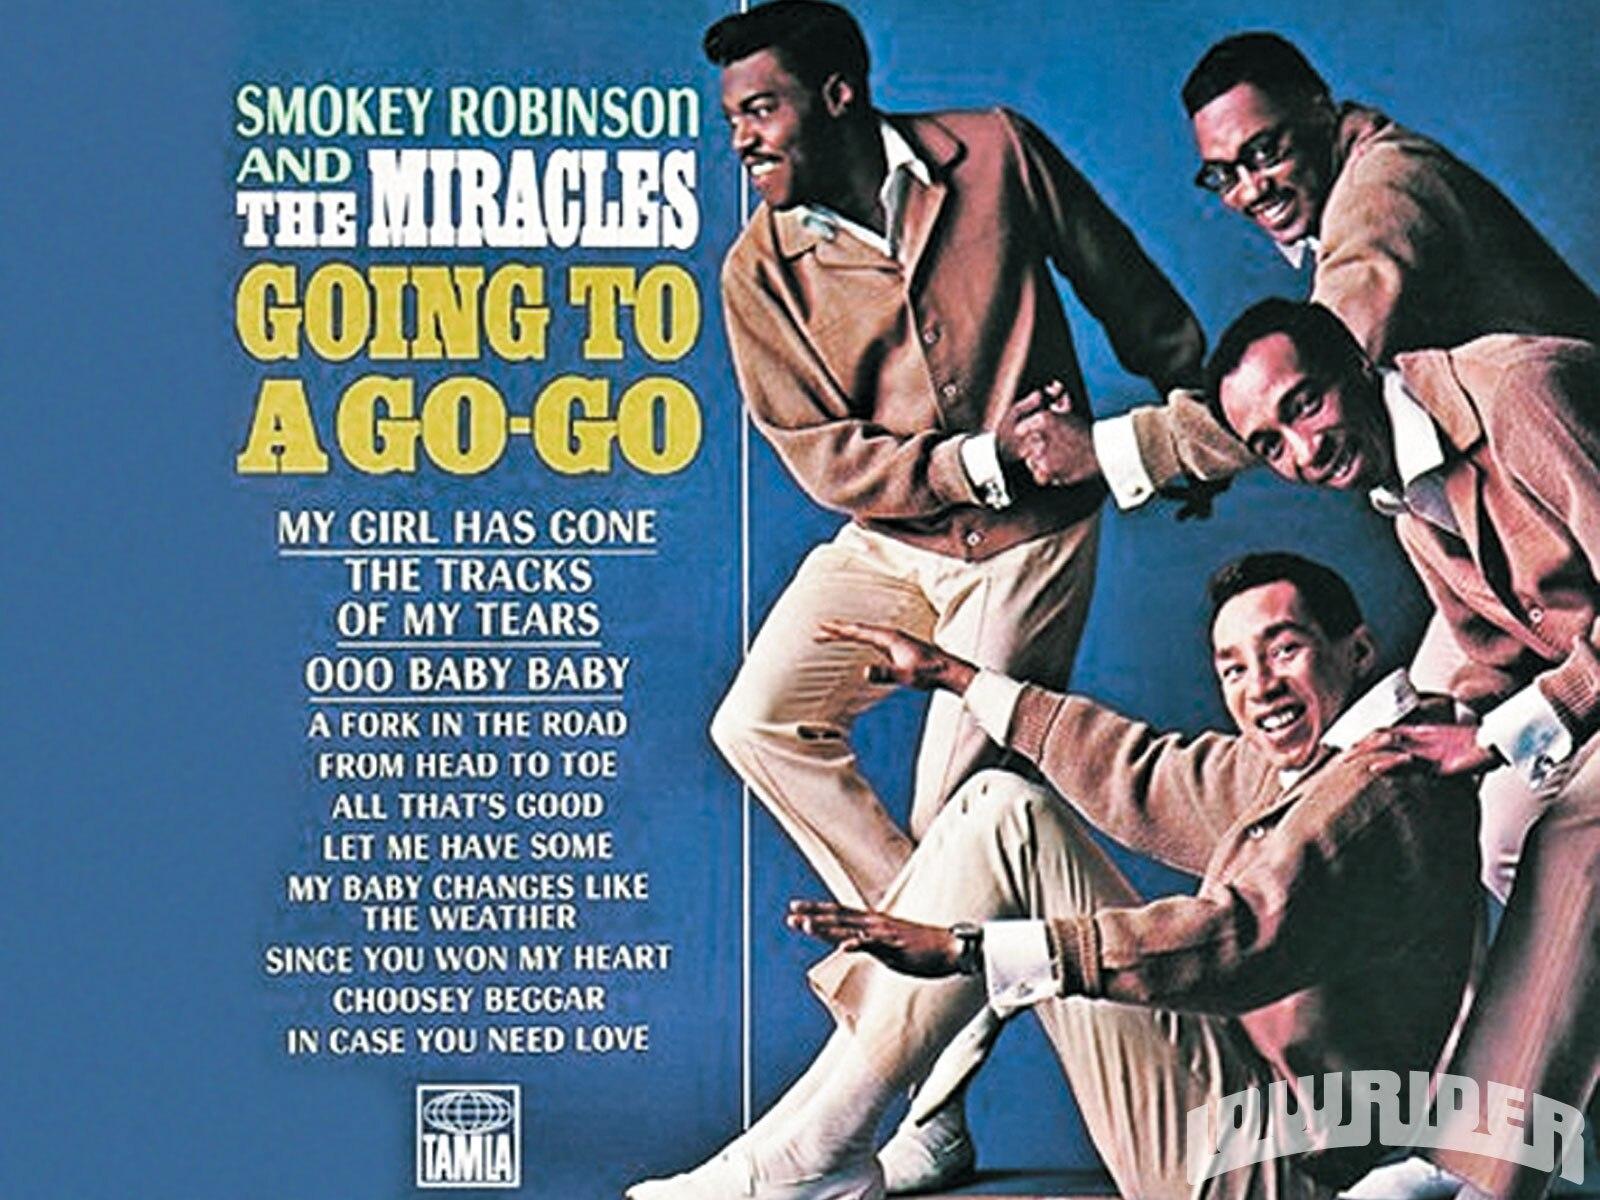 1002_lrmp_02_o-william_smokey_robinson_motown_records-going_to_a_go_go3